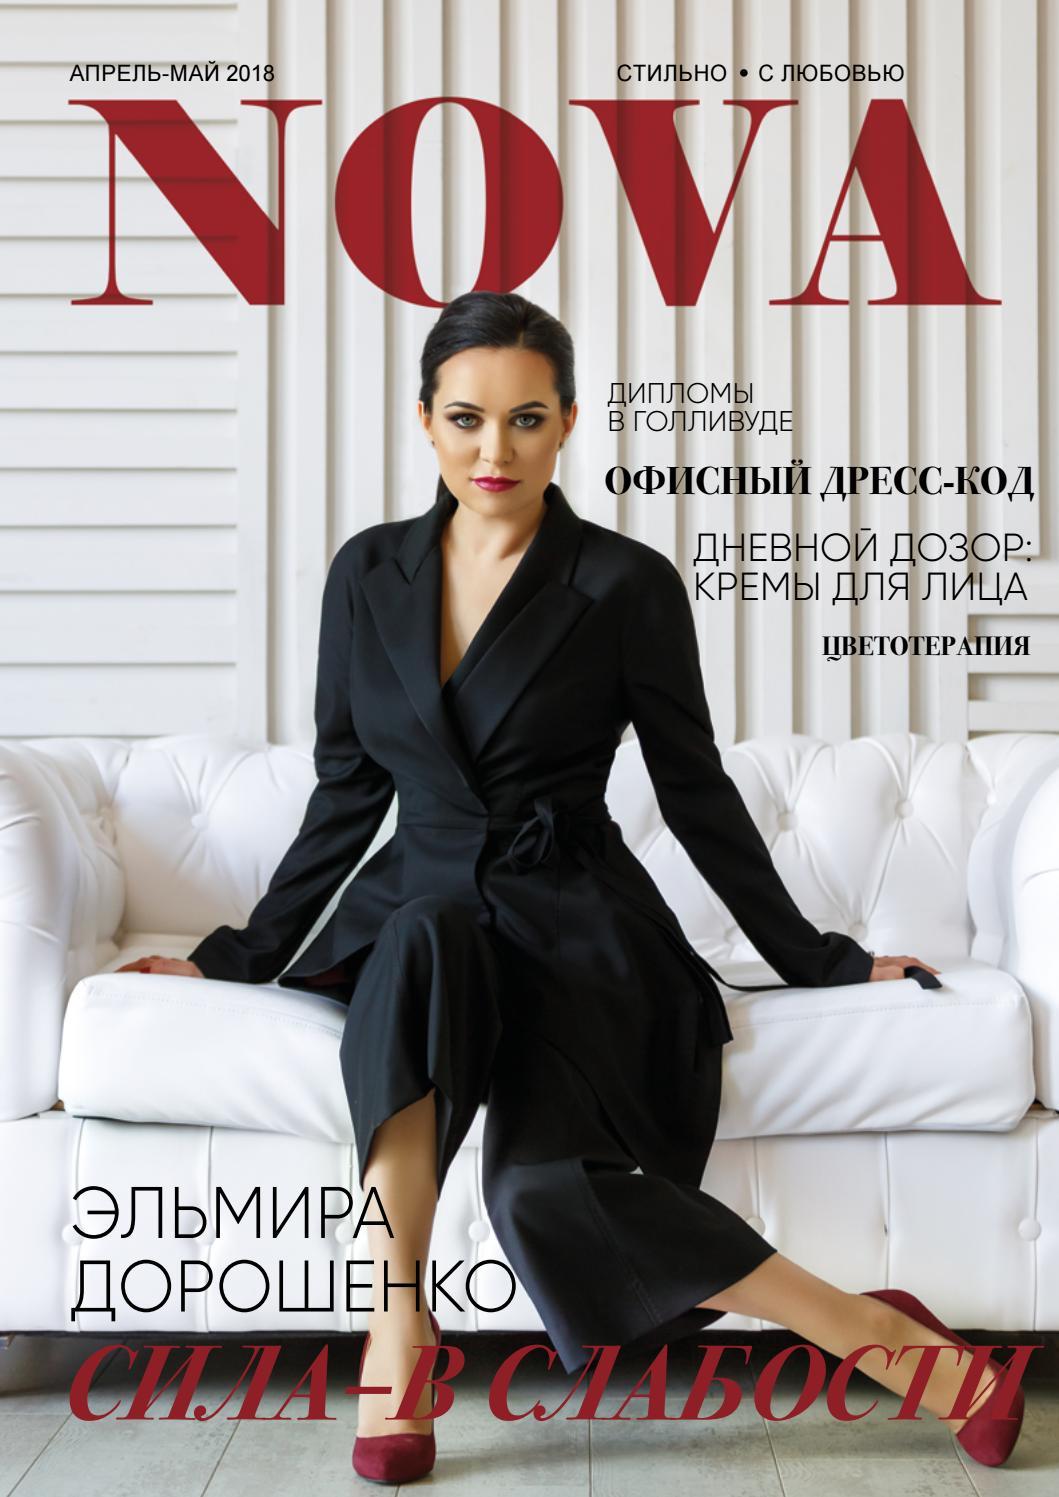 af33ccdce300 NOVA april may 2018 by NOVA magazine - issuu